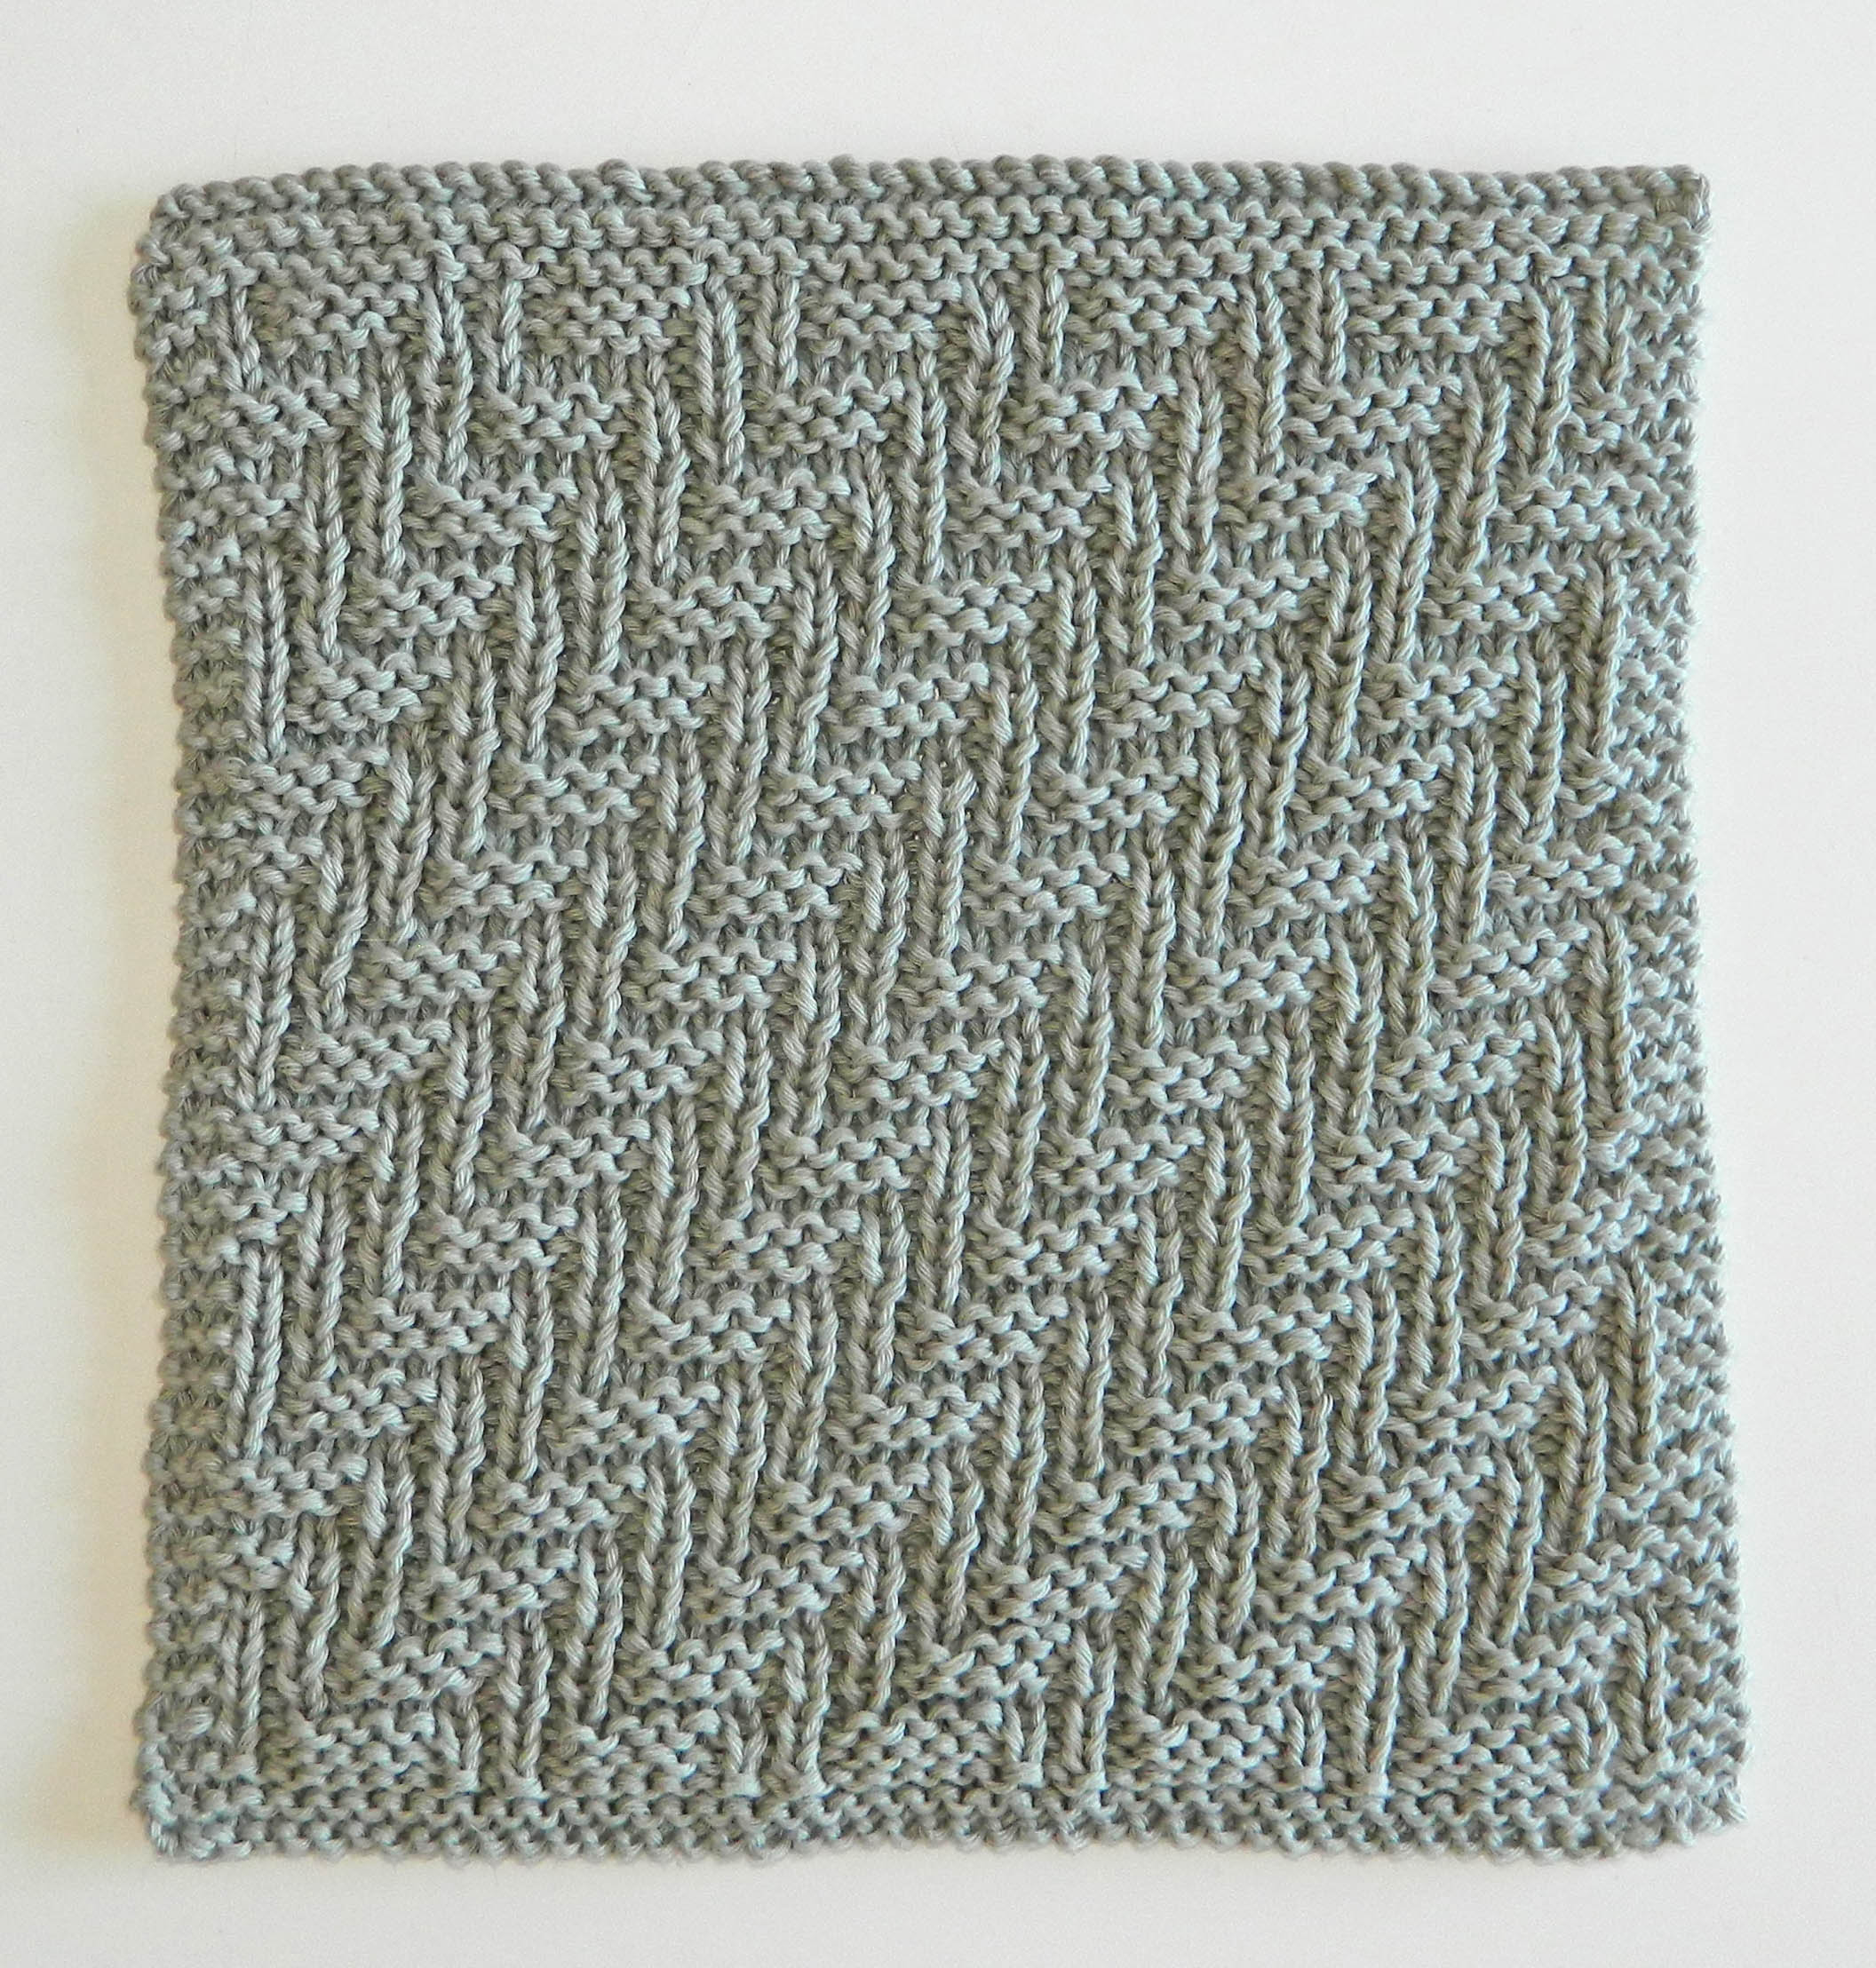 BLOCK 6 of 12 blocks of Xmas knitted blanket – OhLaLana!